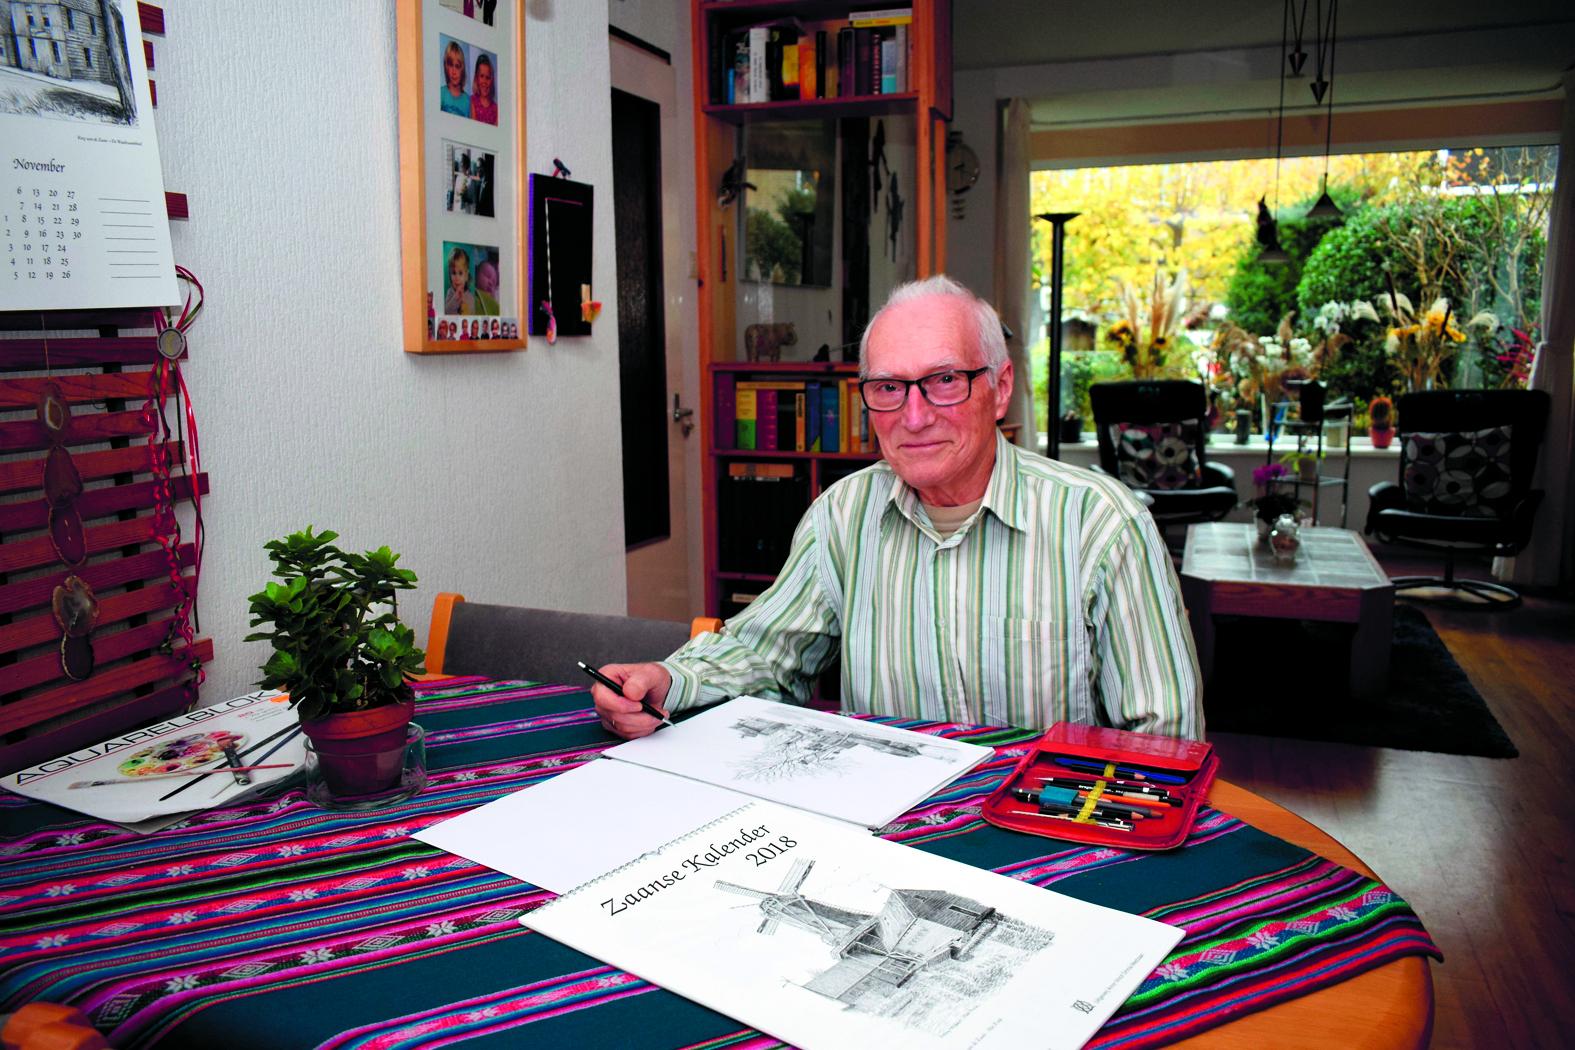 Dick Vonk in zijn woonkamer in Krommenie. (Foto: Yvette van der Does)